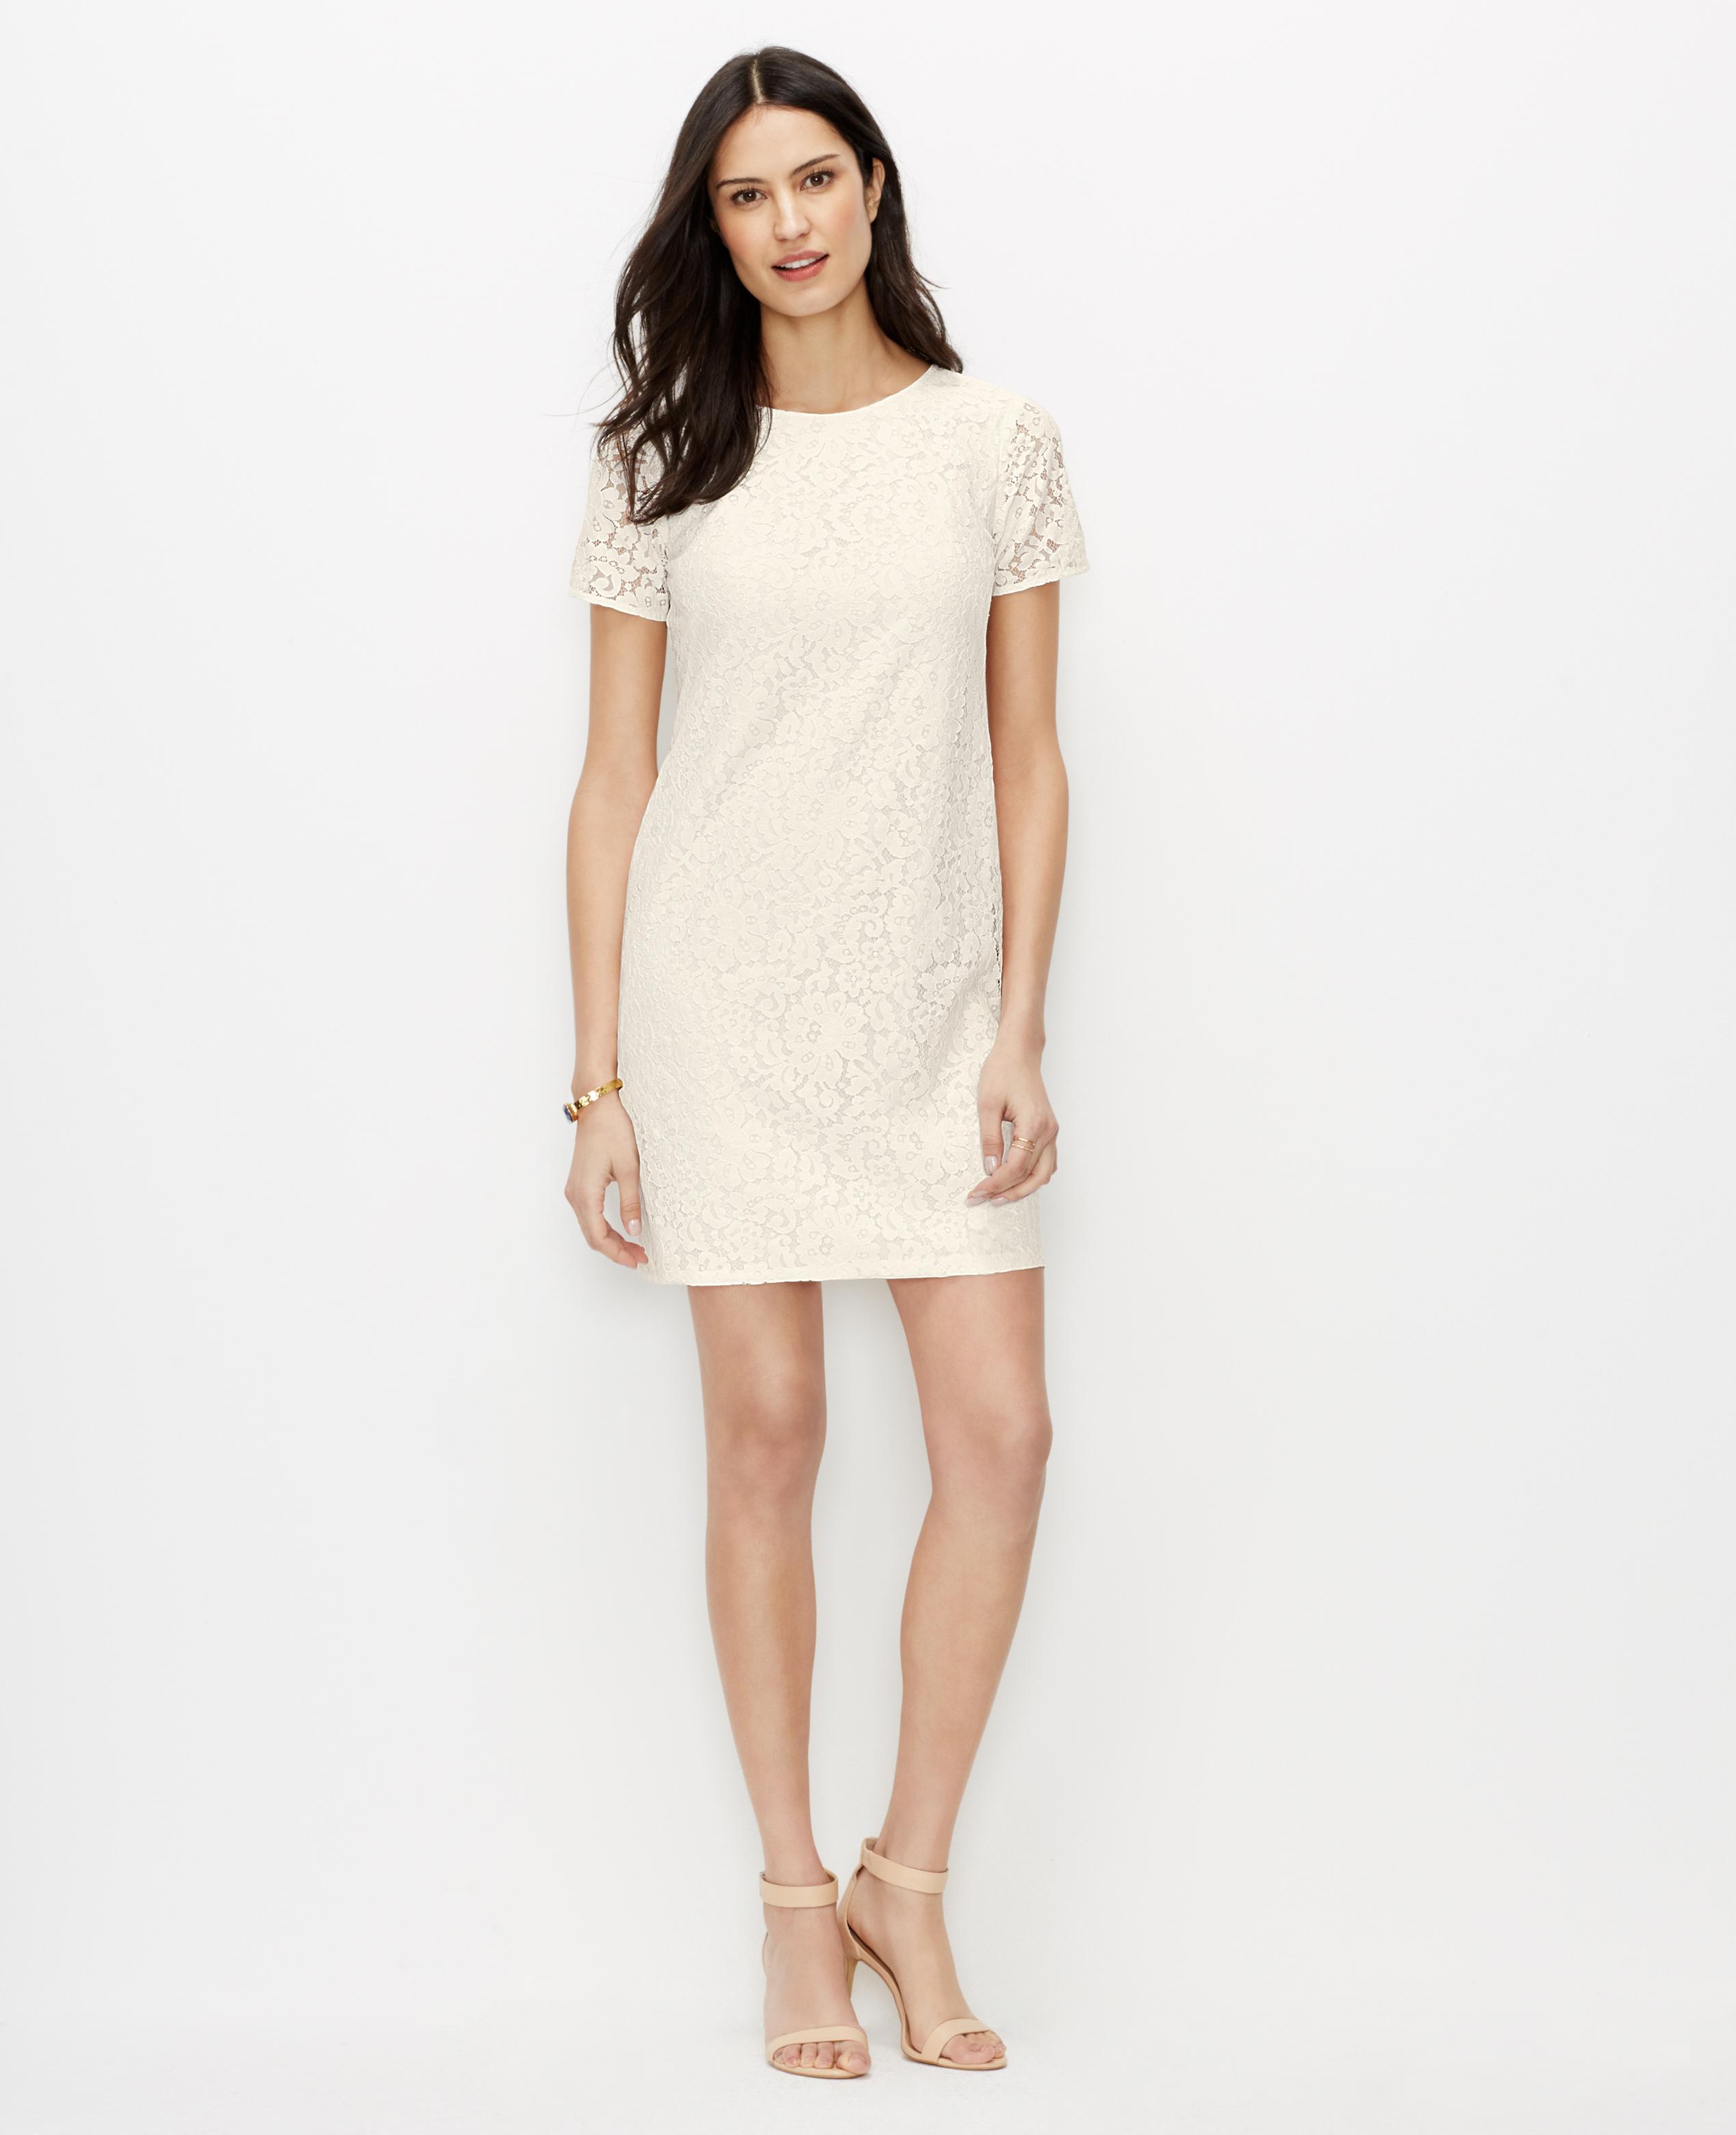 bbf91b9aa4 Ann Taylor White Lace Dresses – Fashion dresses